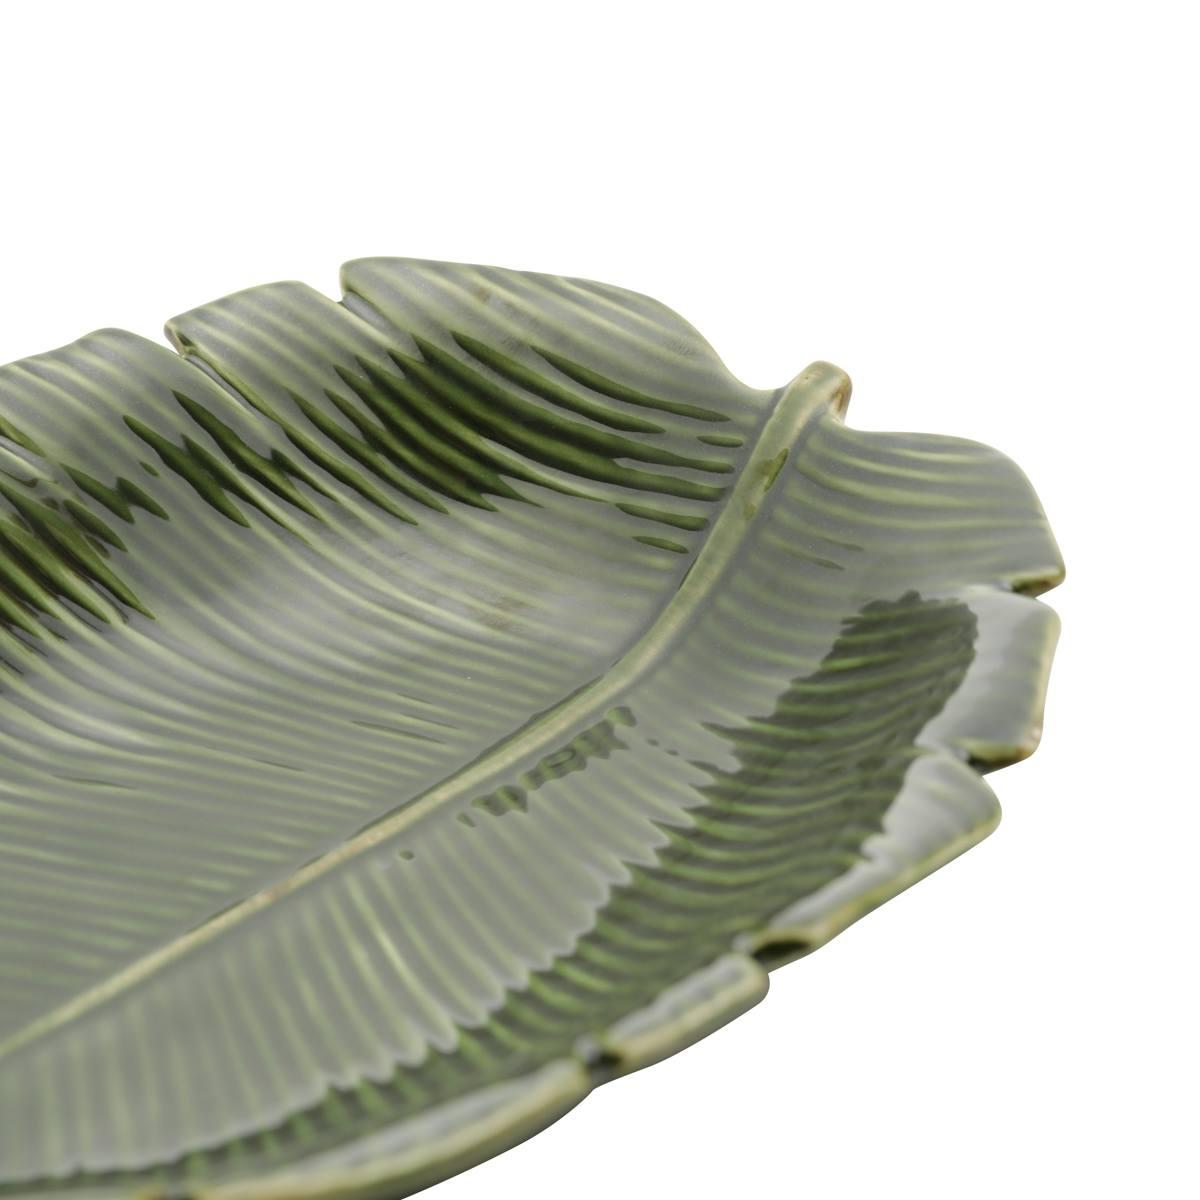 Folha decorativa cerâmica banana leaf verde 23x16x4,5cm Lyor